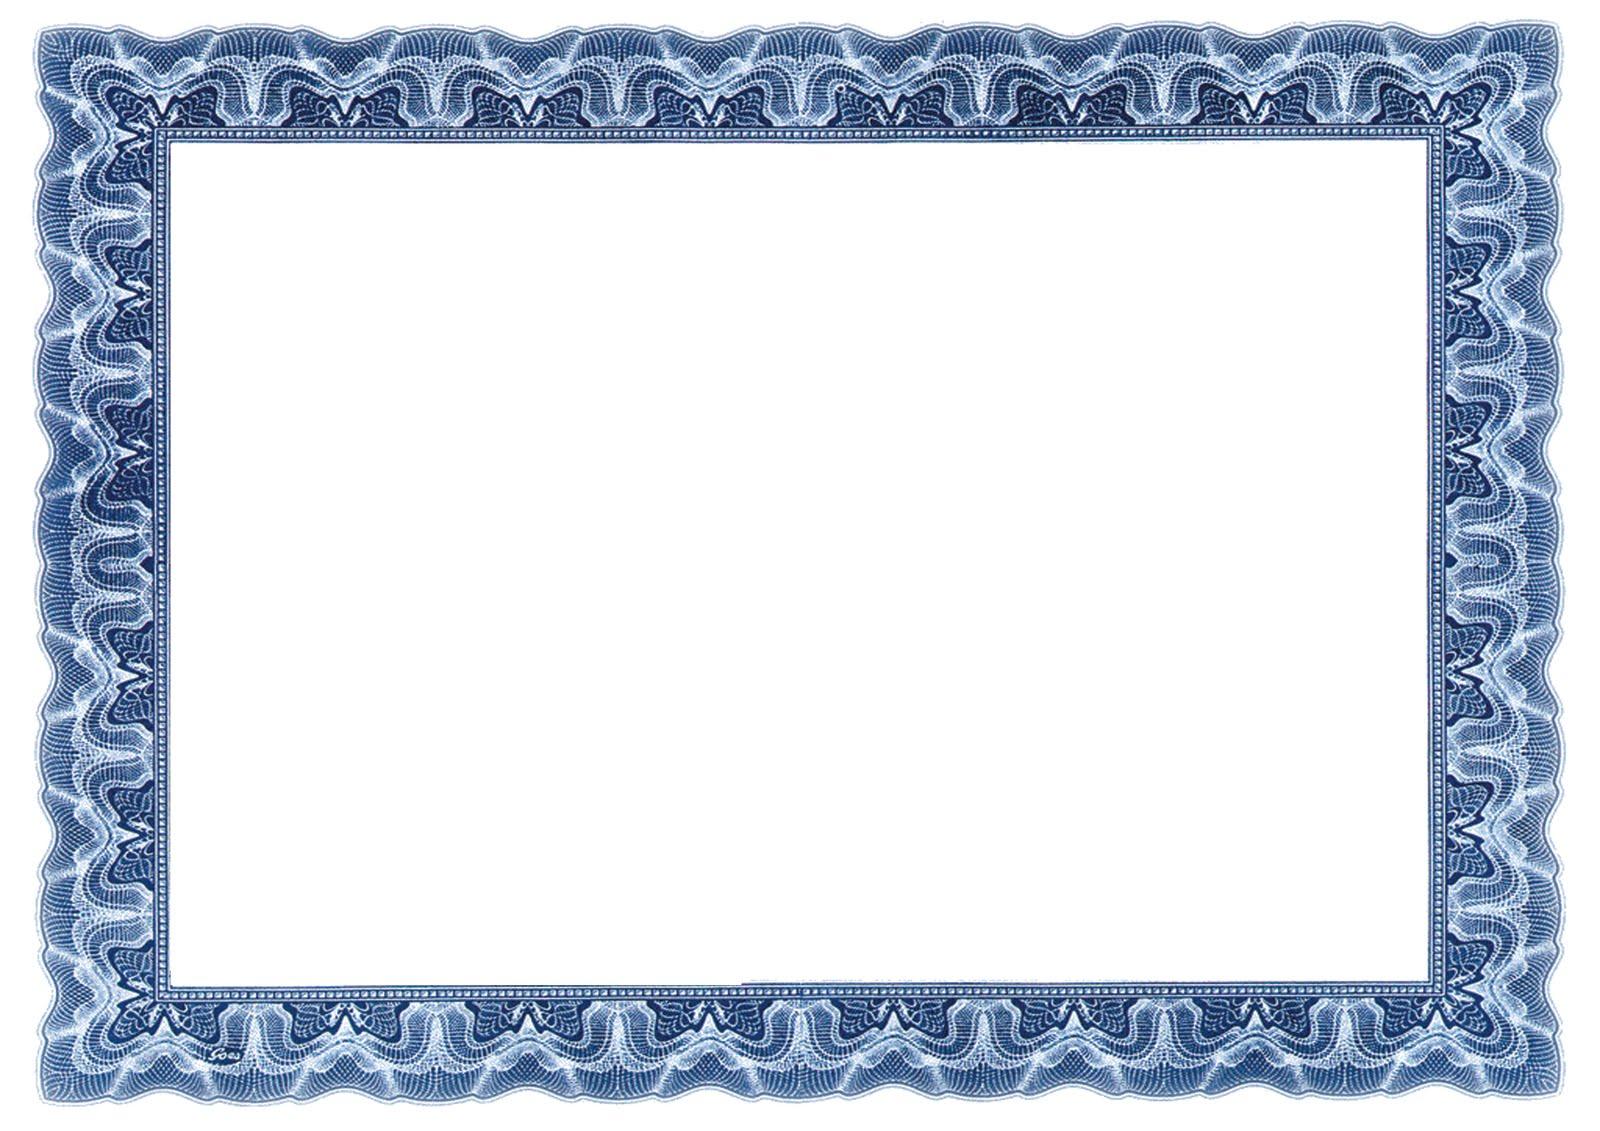 Bingkai Sertifikat Word Image Gallery - HCPR